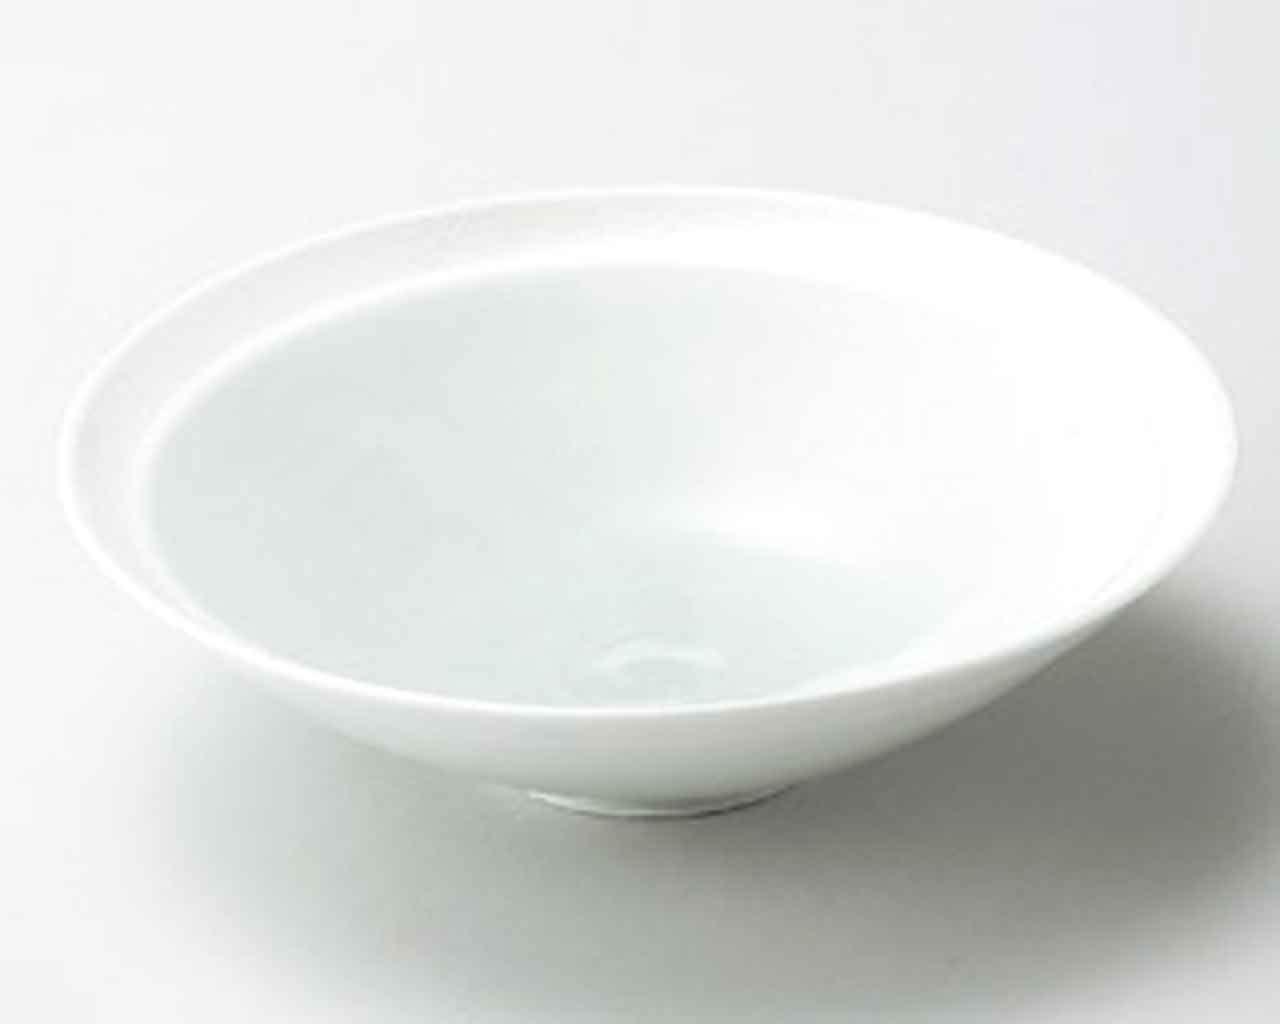 Hiwa Green Blow 6.5inch Set of 2 Medium Plates White porcelain Made in Japan